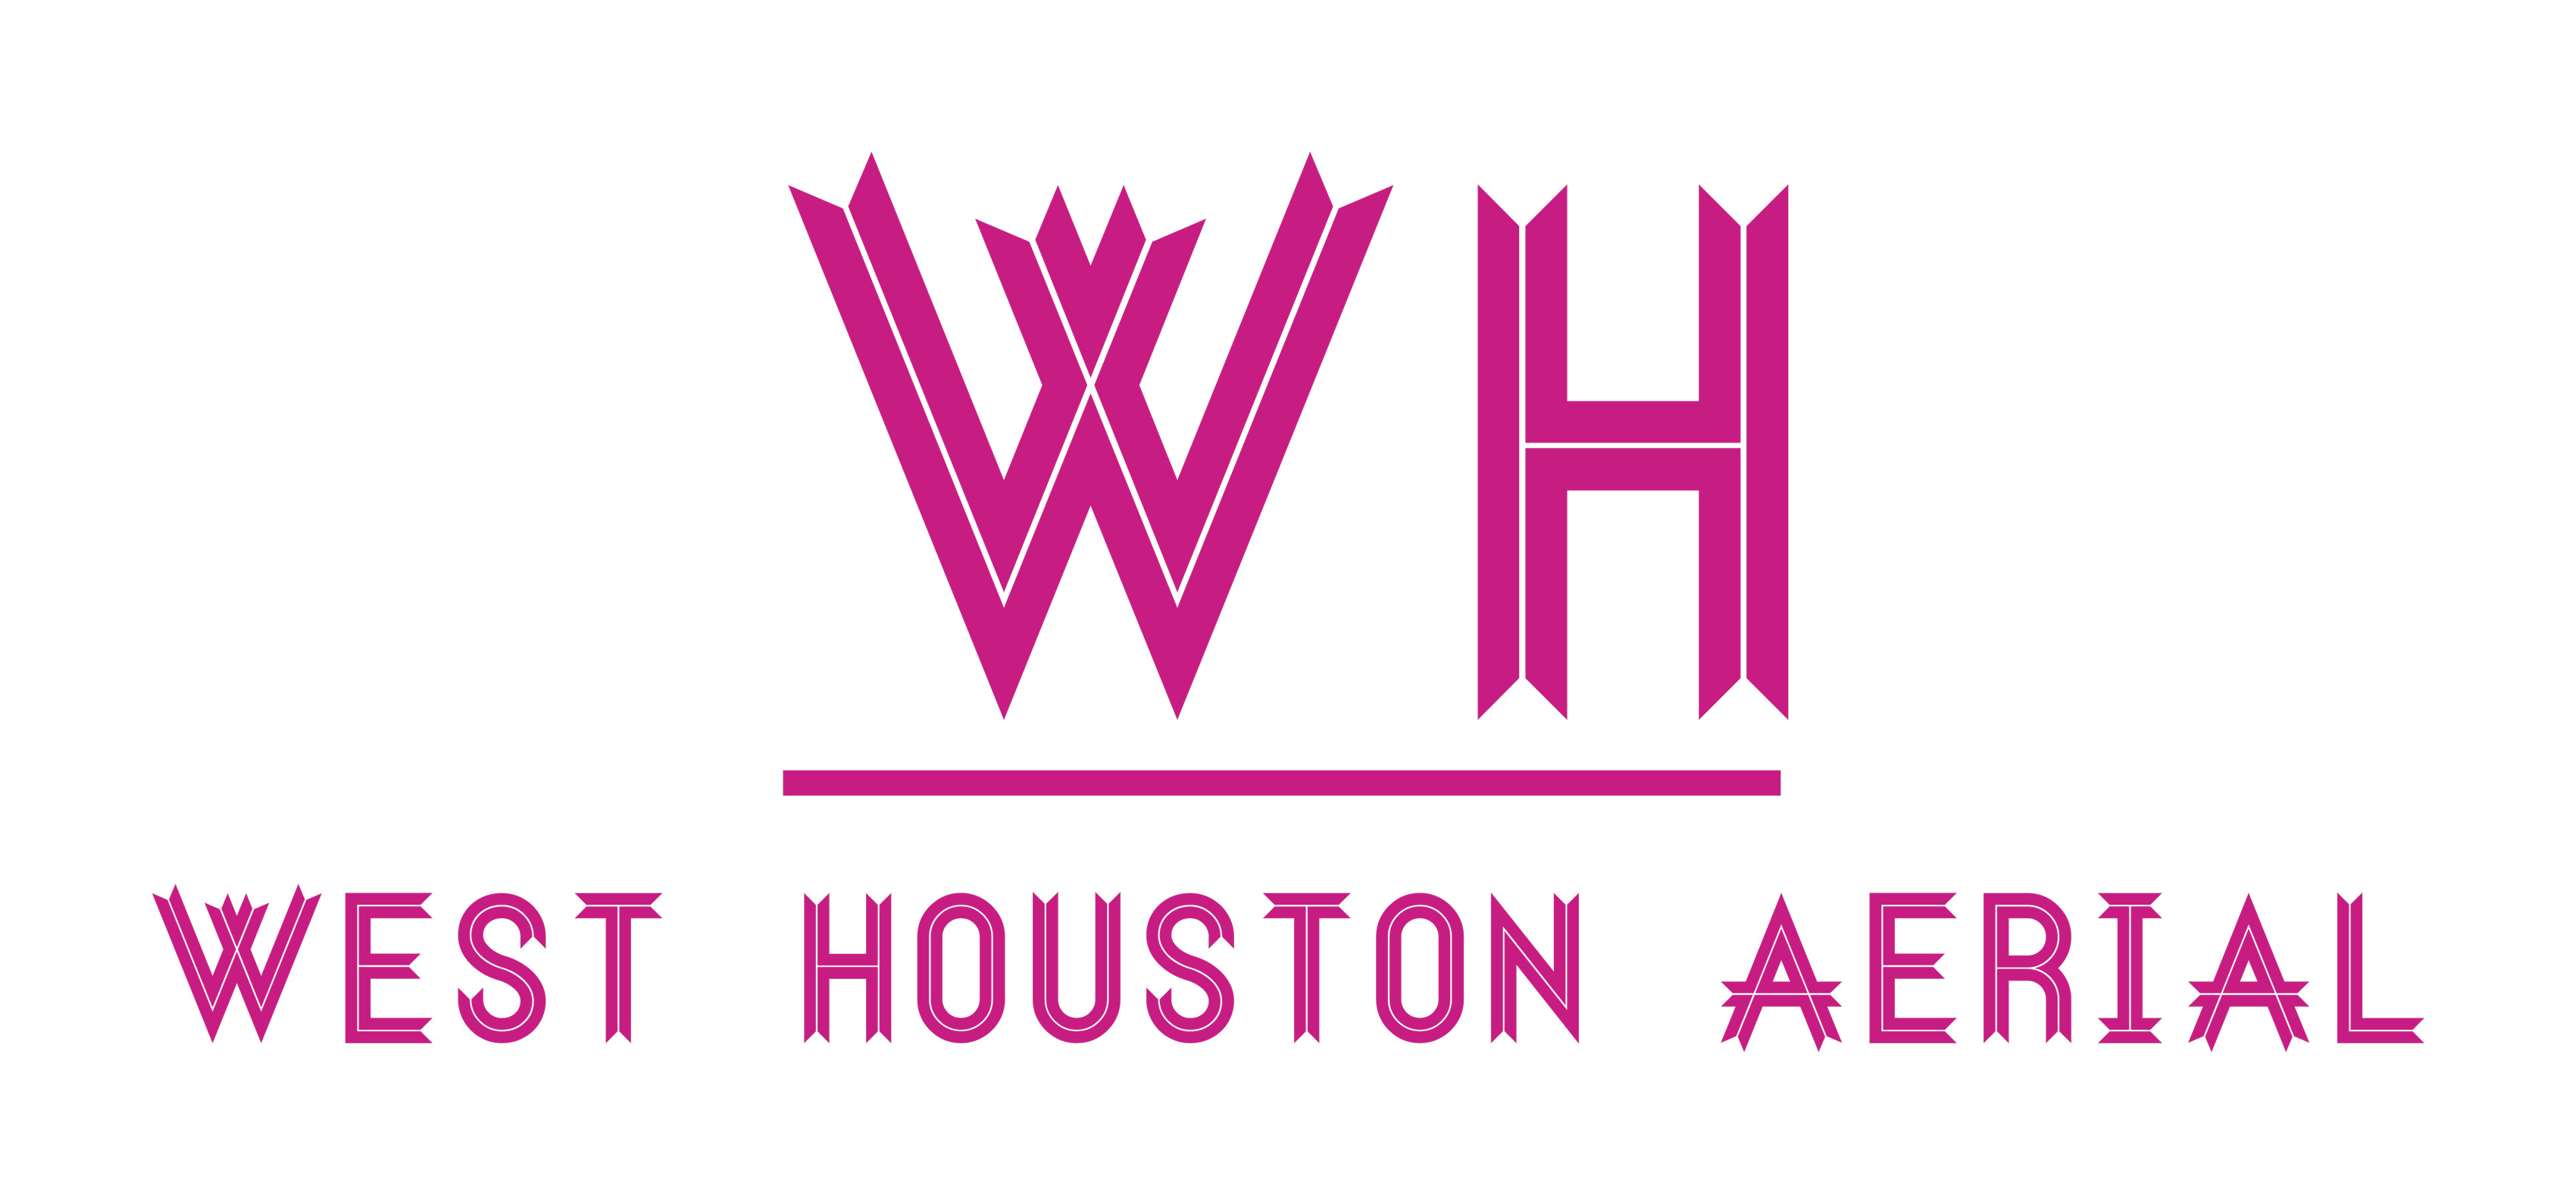 West Houston Aerial